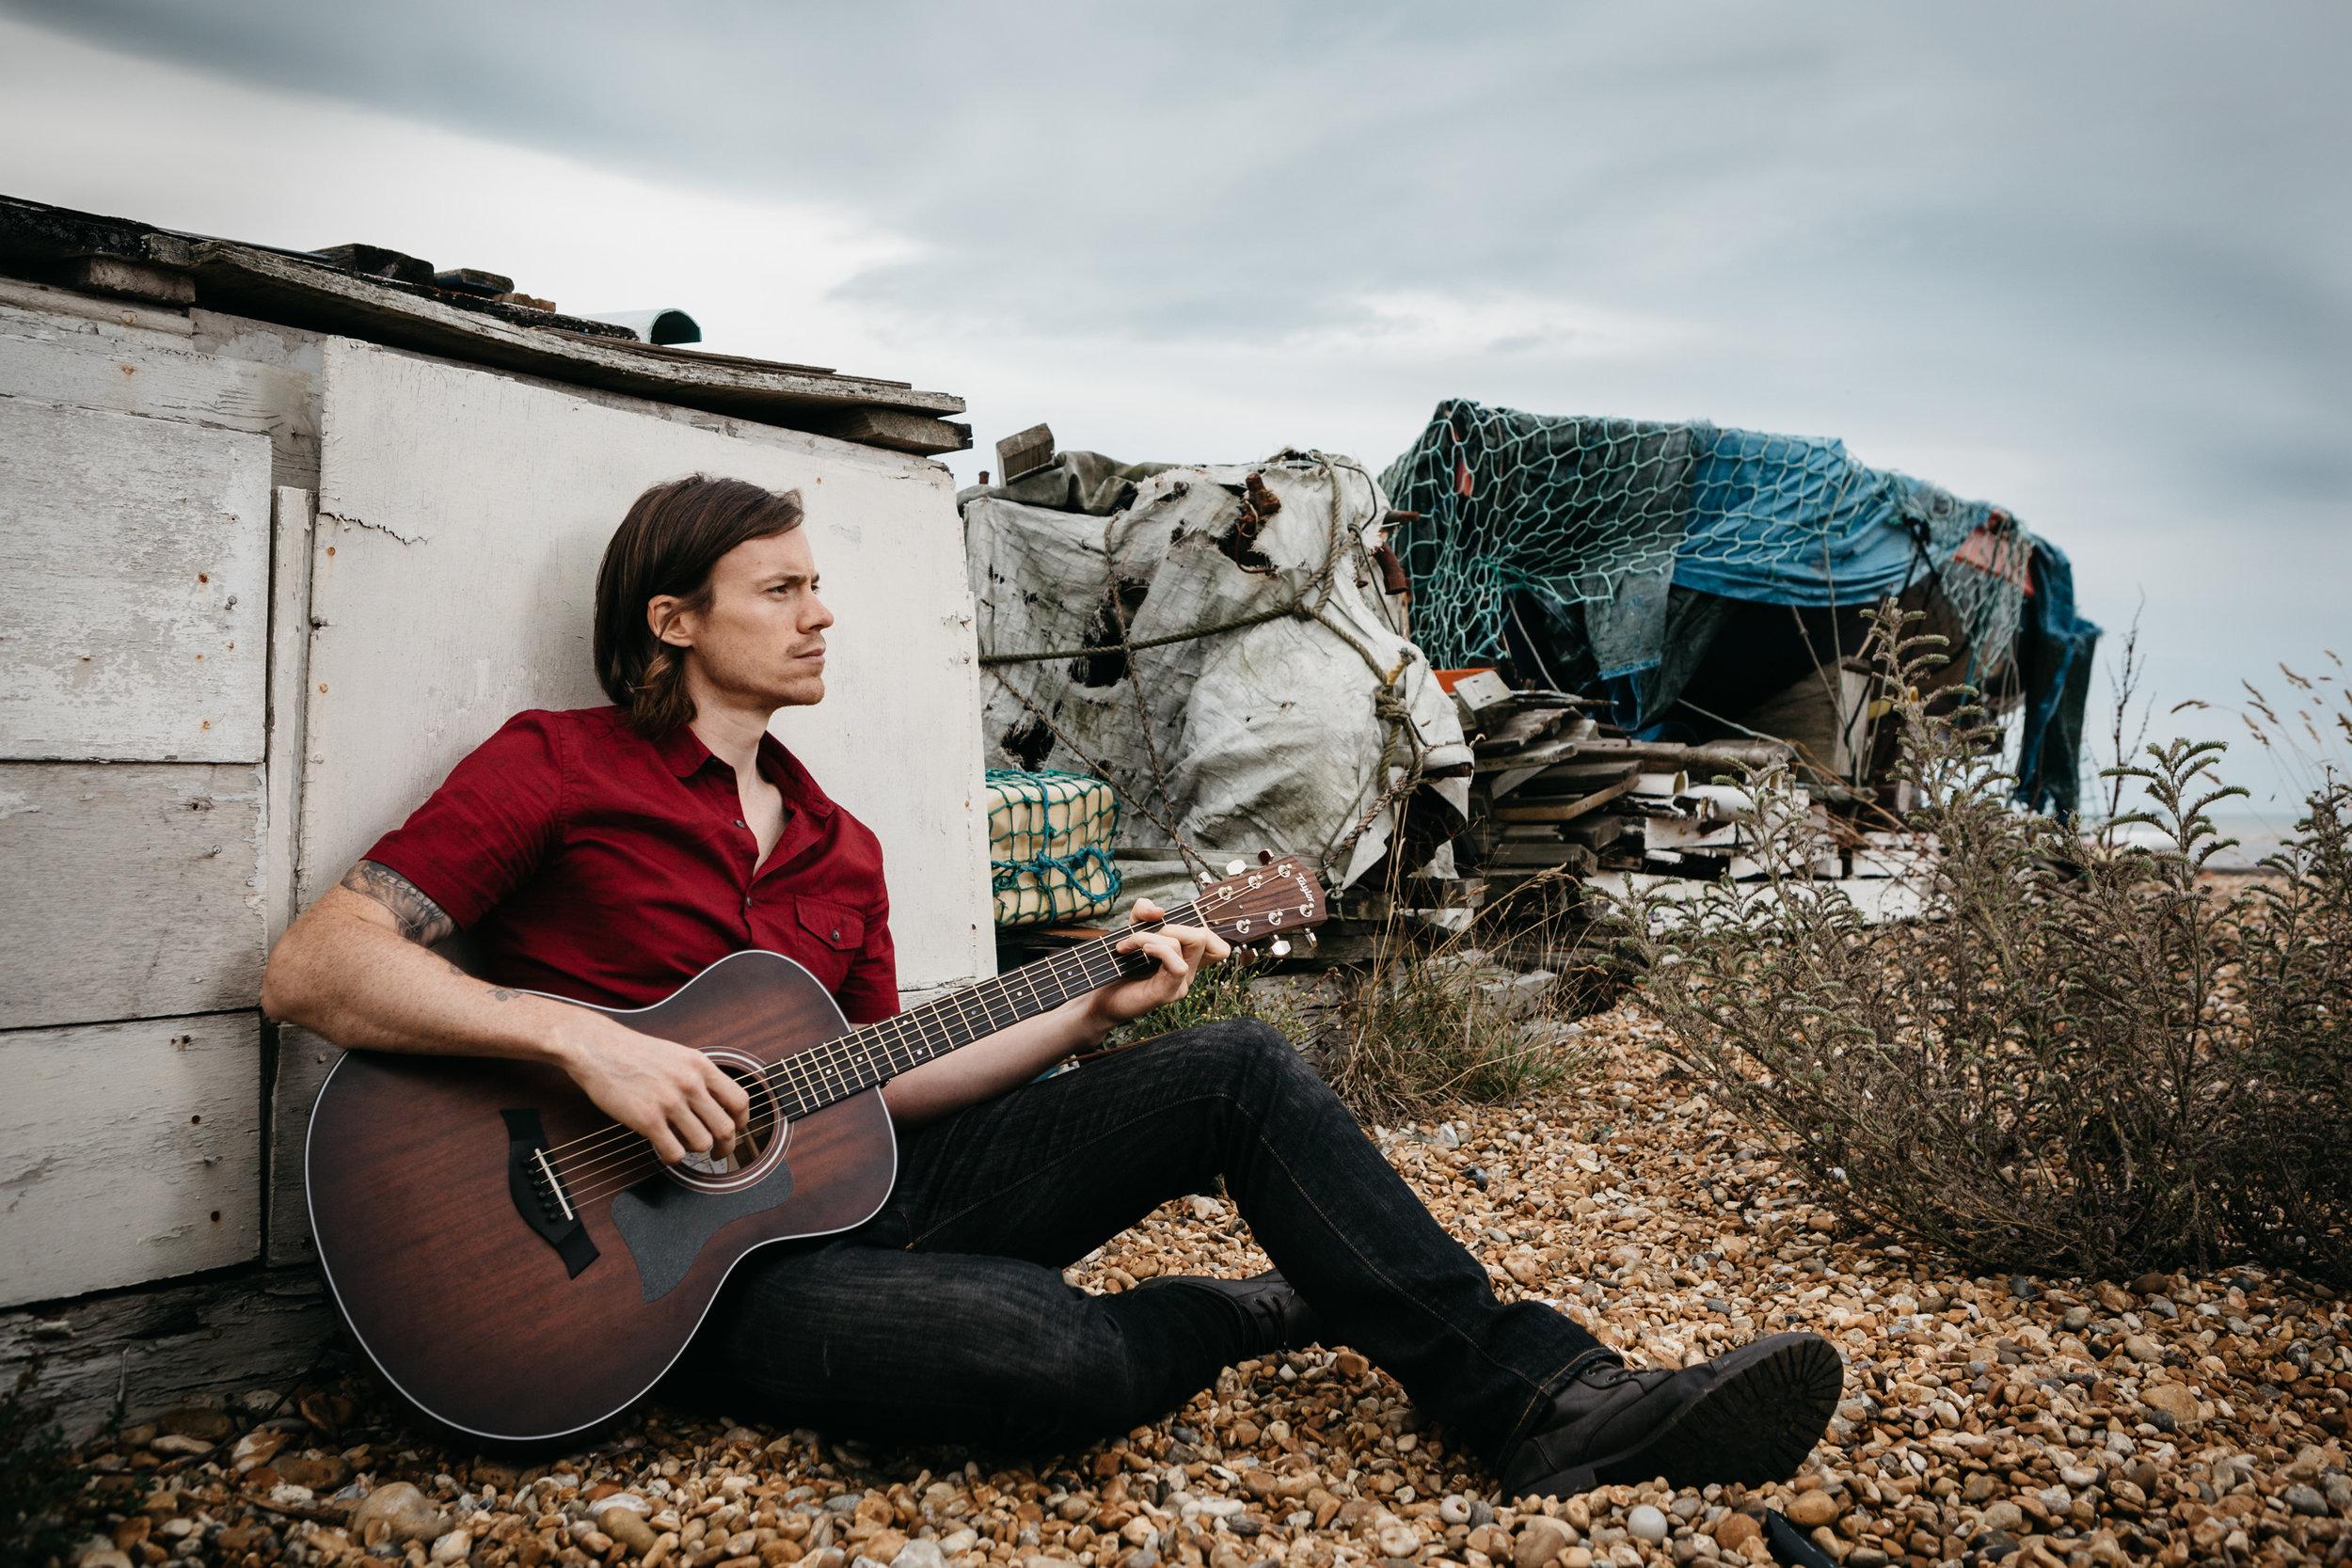 Performance Promo Shot of Singer Songwriter Scott Swain at Dungeness, Kent